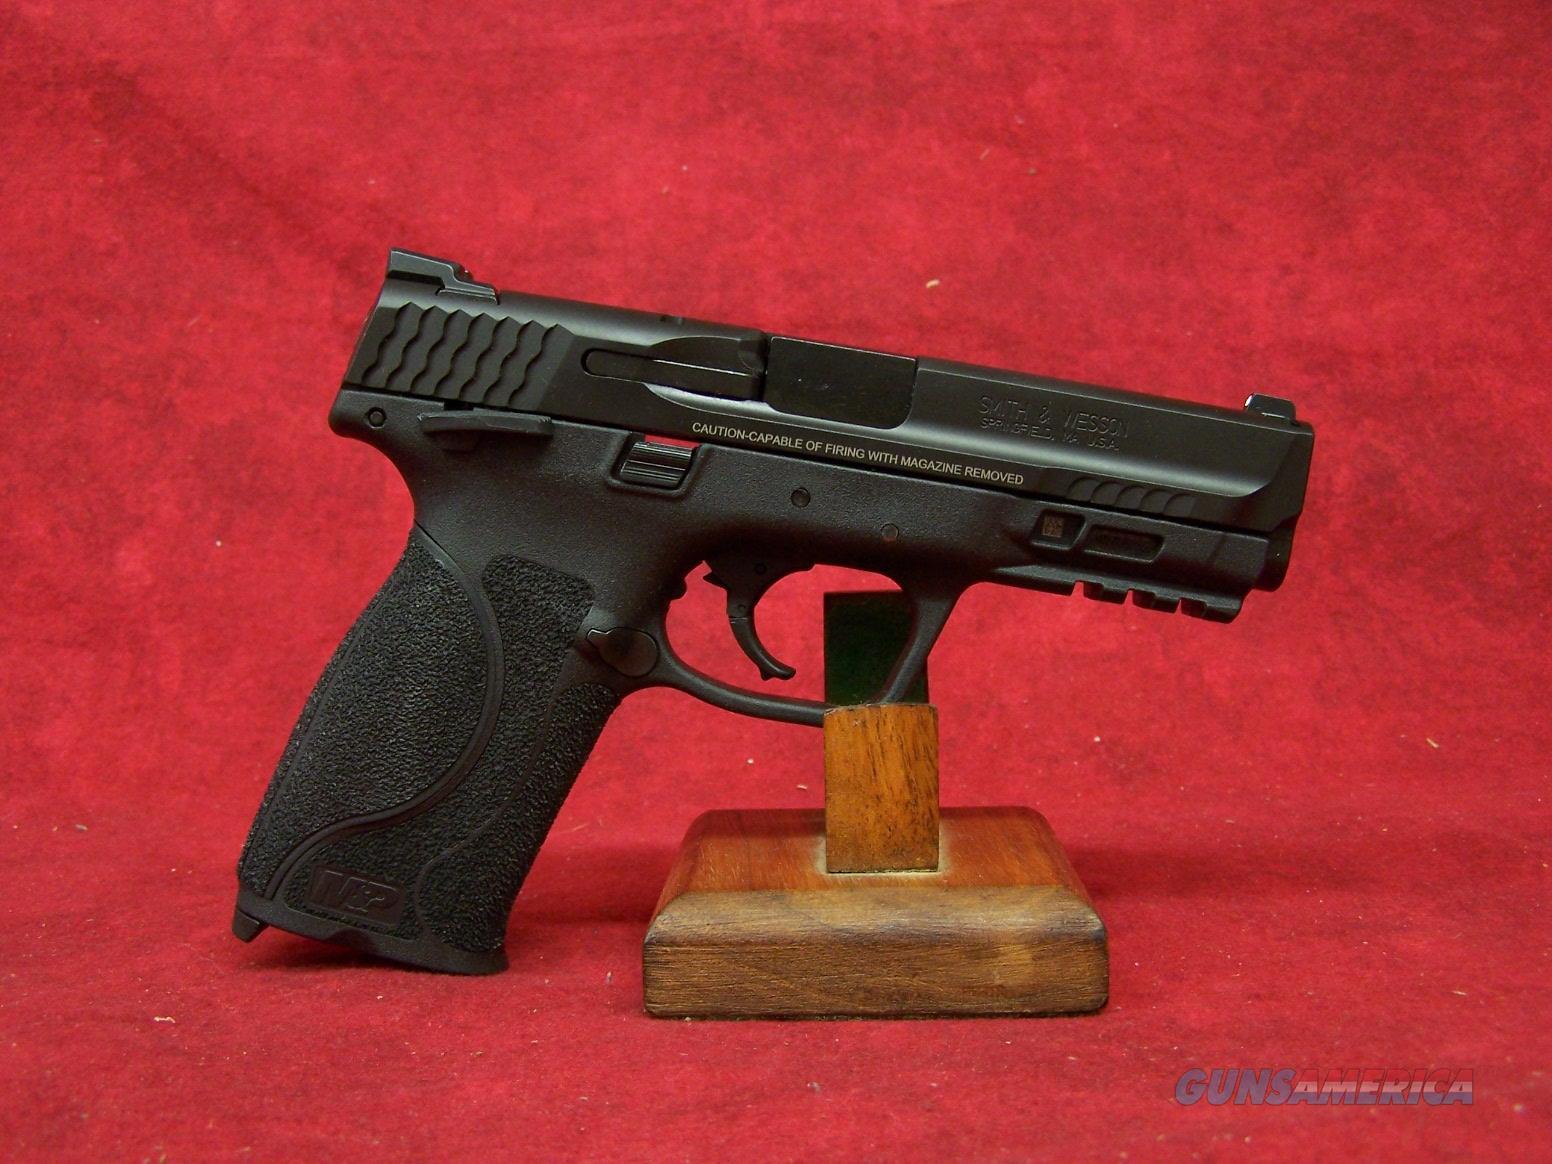 Smith & Wesson M&P 9 M2.0 Striker Fire 9mm 4.25 Inch Barrel (11524)  Guns > Pistols > Smith & Wesson Pistols - Autos > Polymer Frame